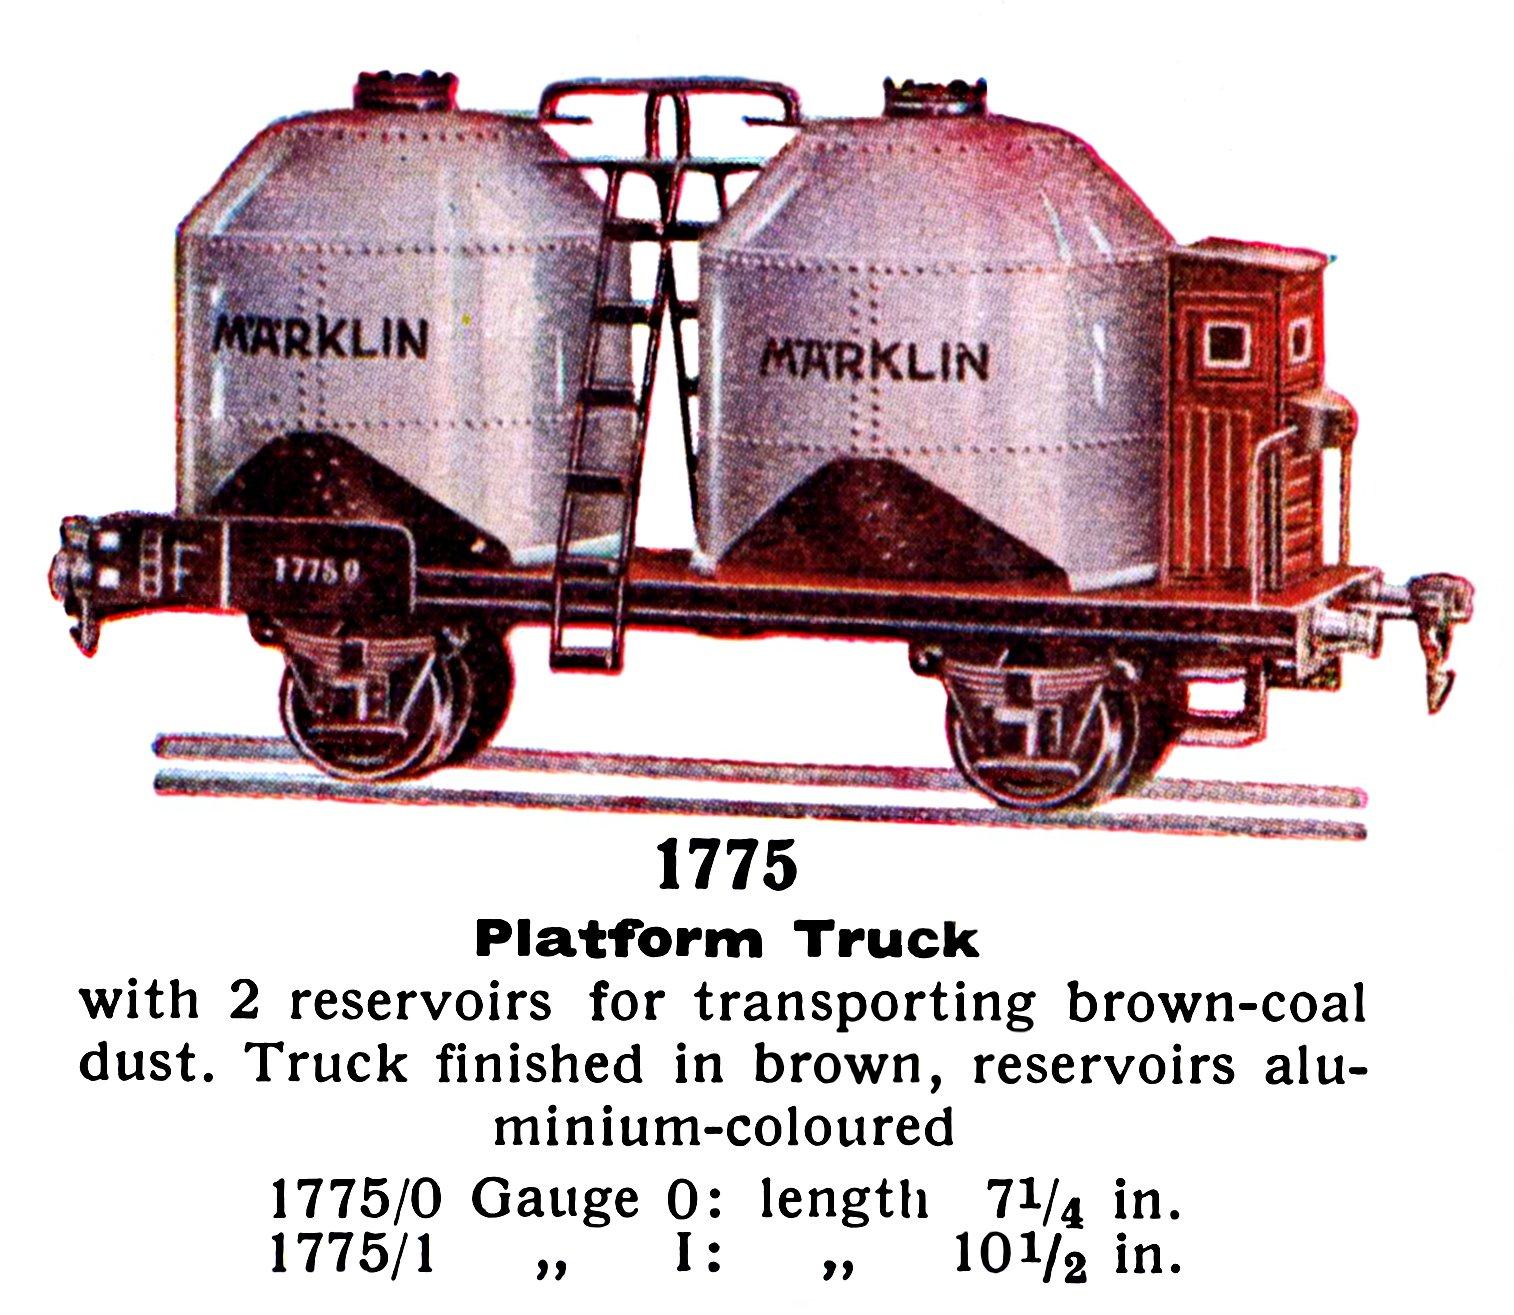 marklin model trains